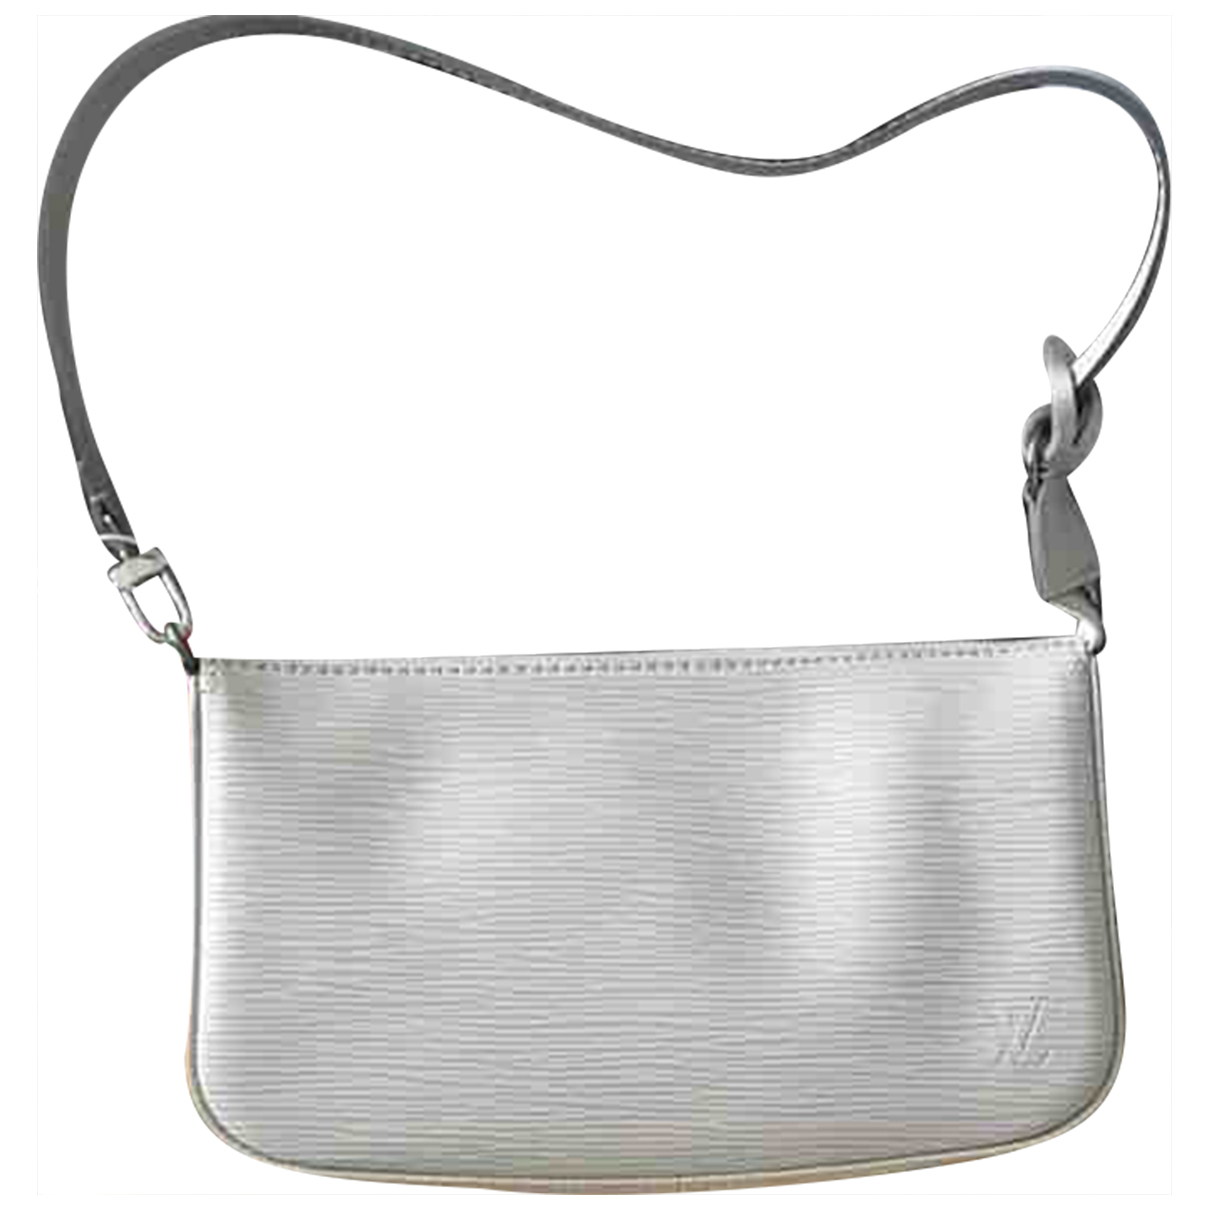 Louis Vuitton Pochette Accessoire Clutch in  Weiss Leder